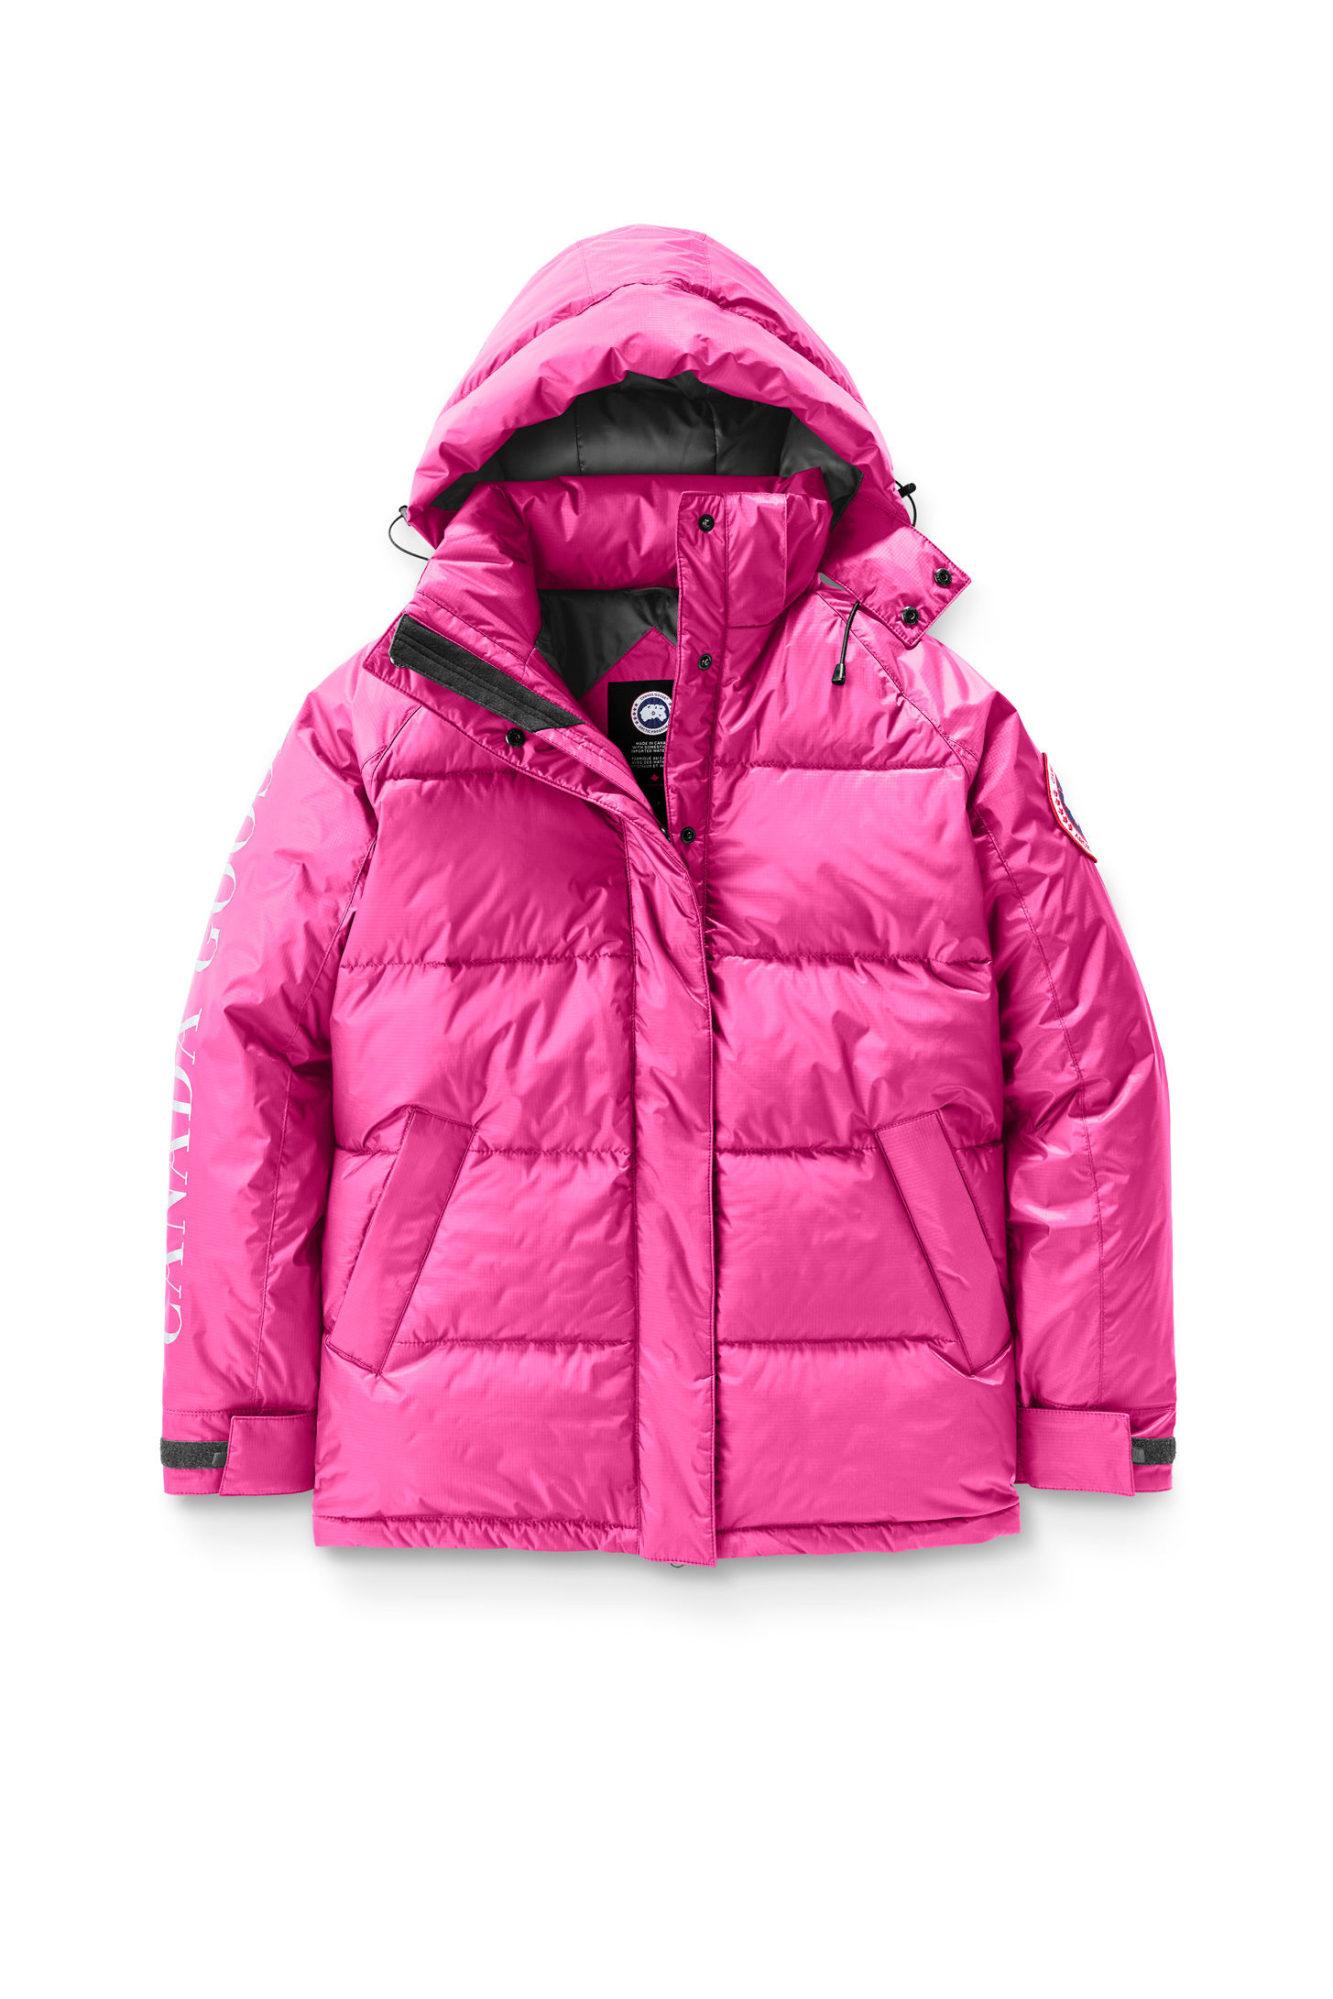 9a0eda4fe411 Women's Approach Jacket | Canada Goose®